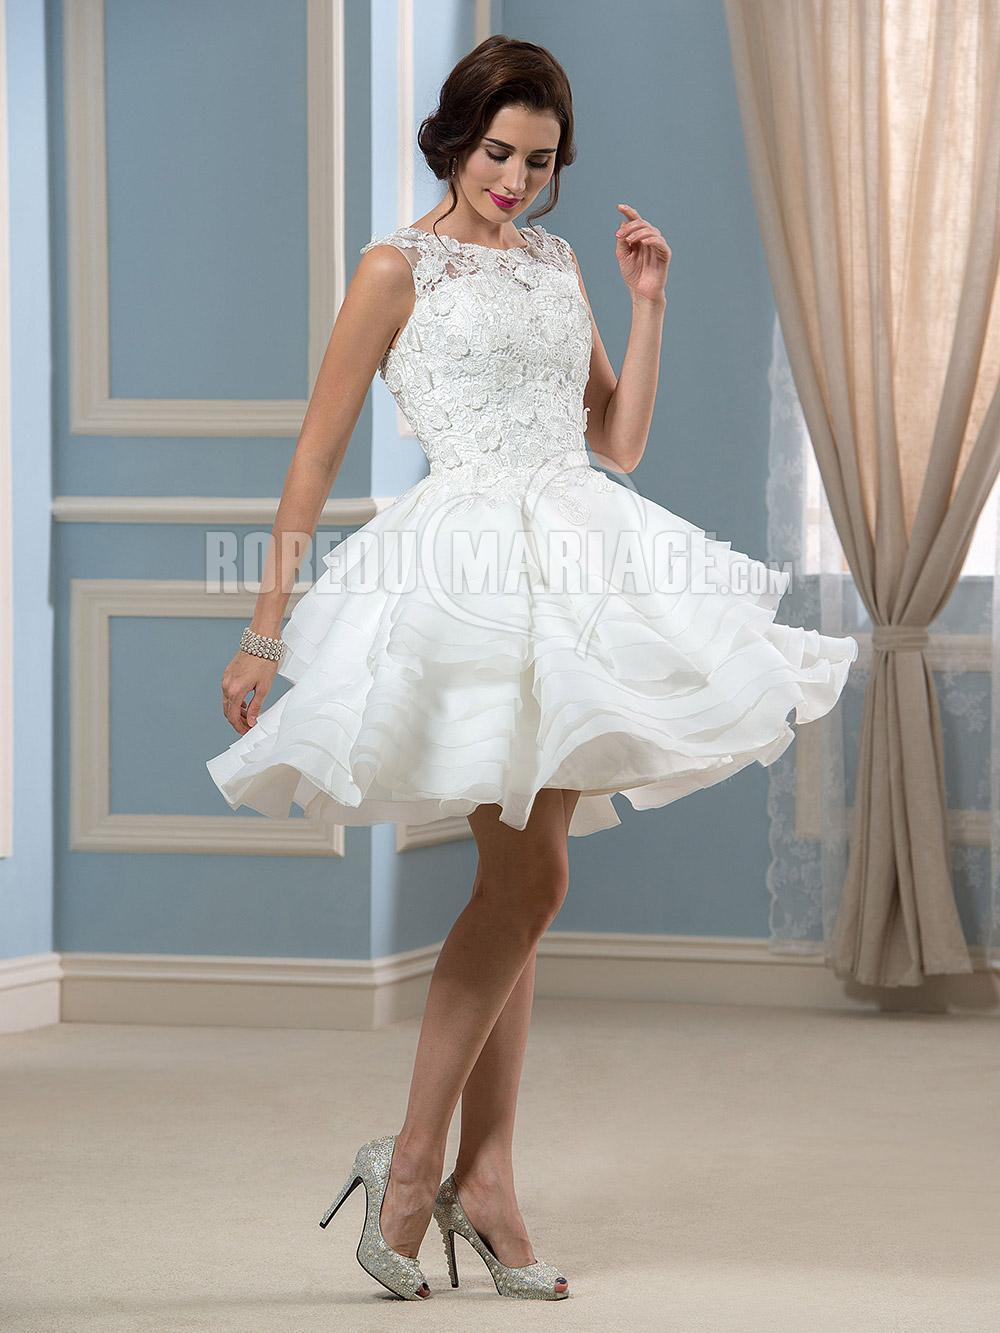 > Robe de mariage > Robe de mariée civile > Robe de mariée civile ...